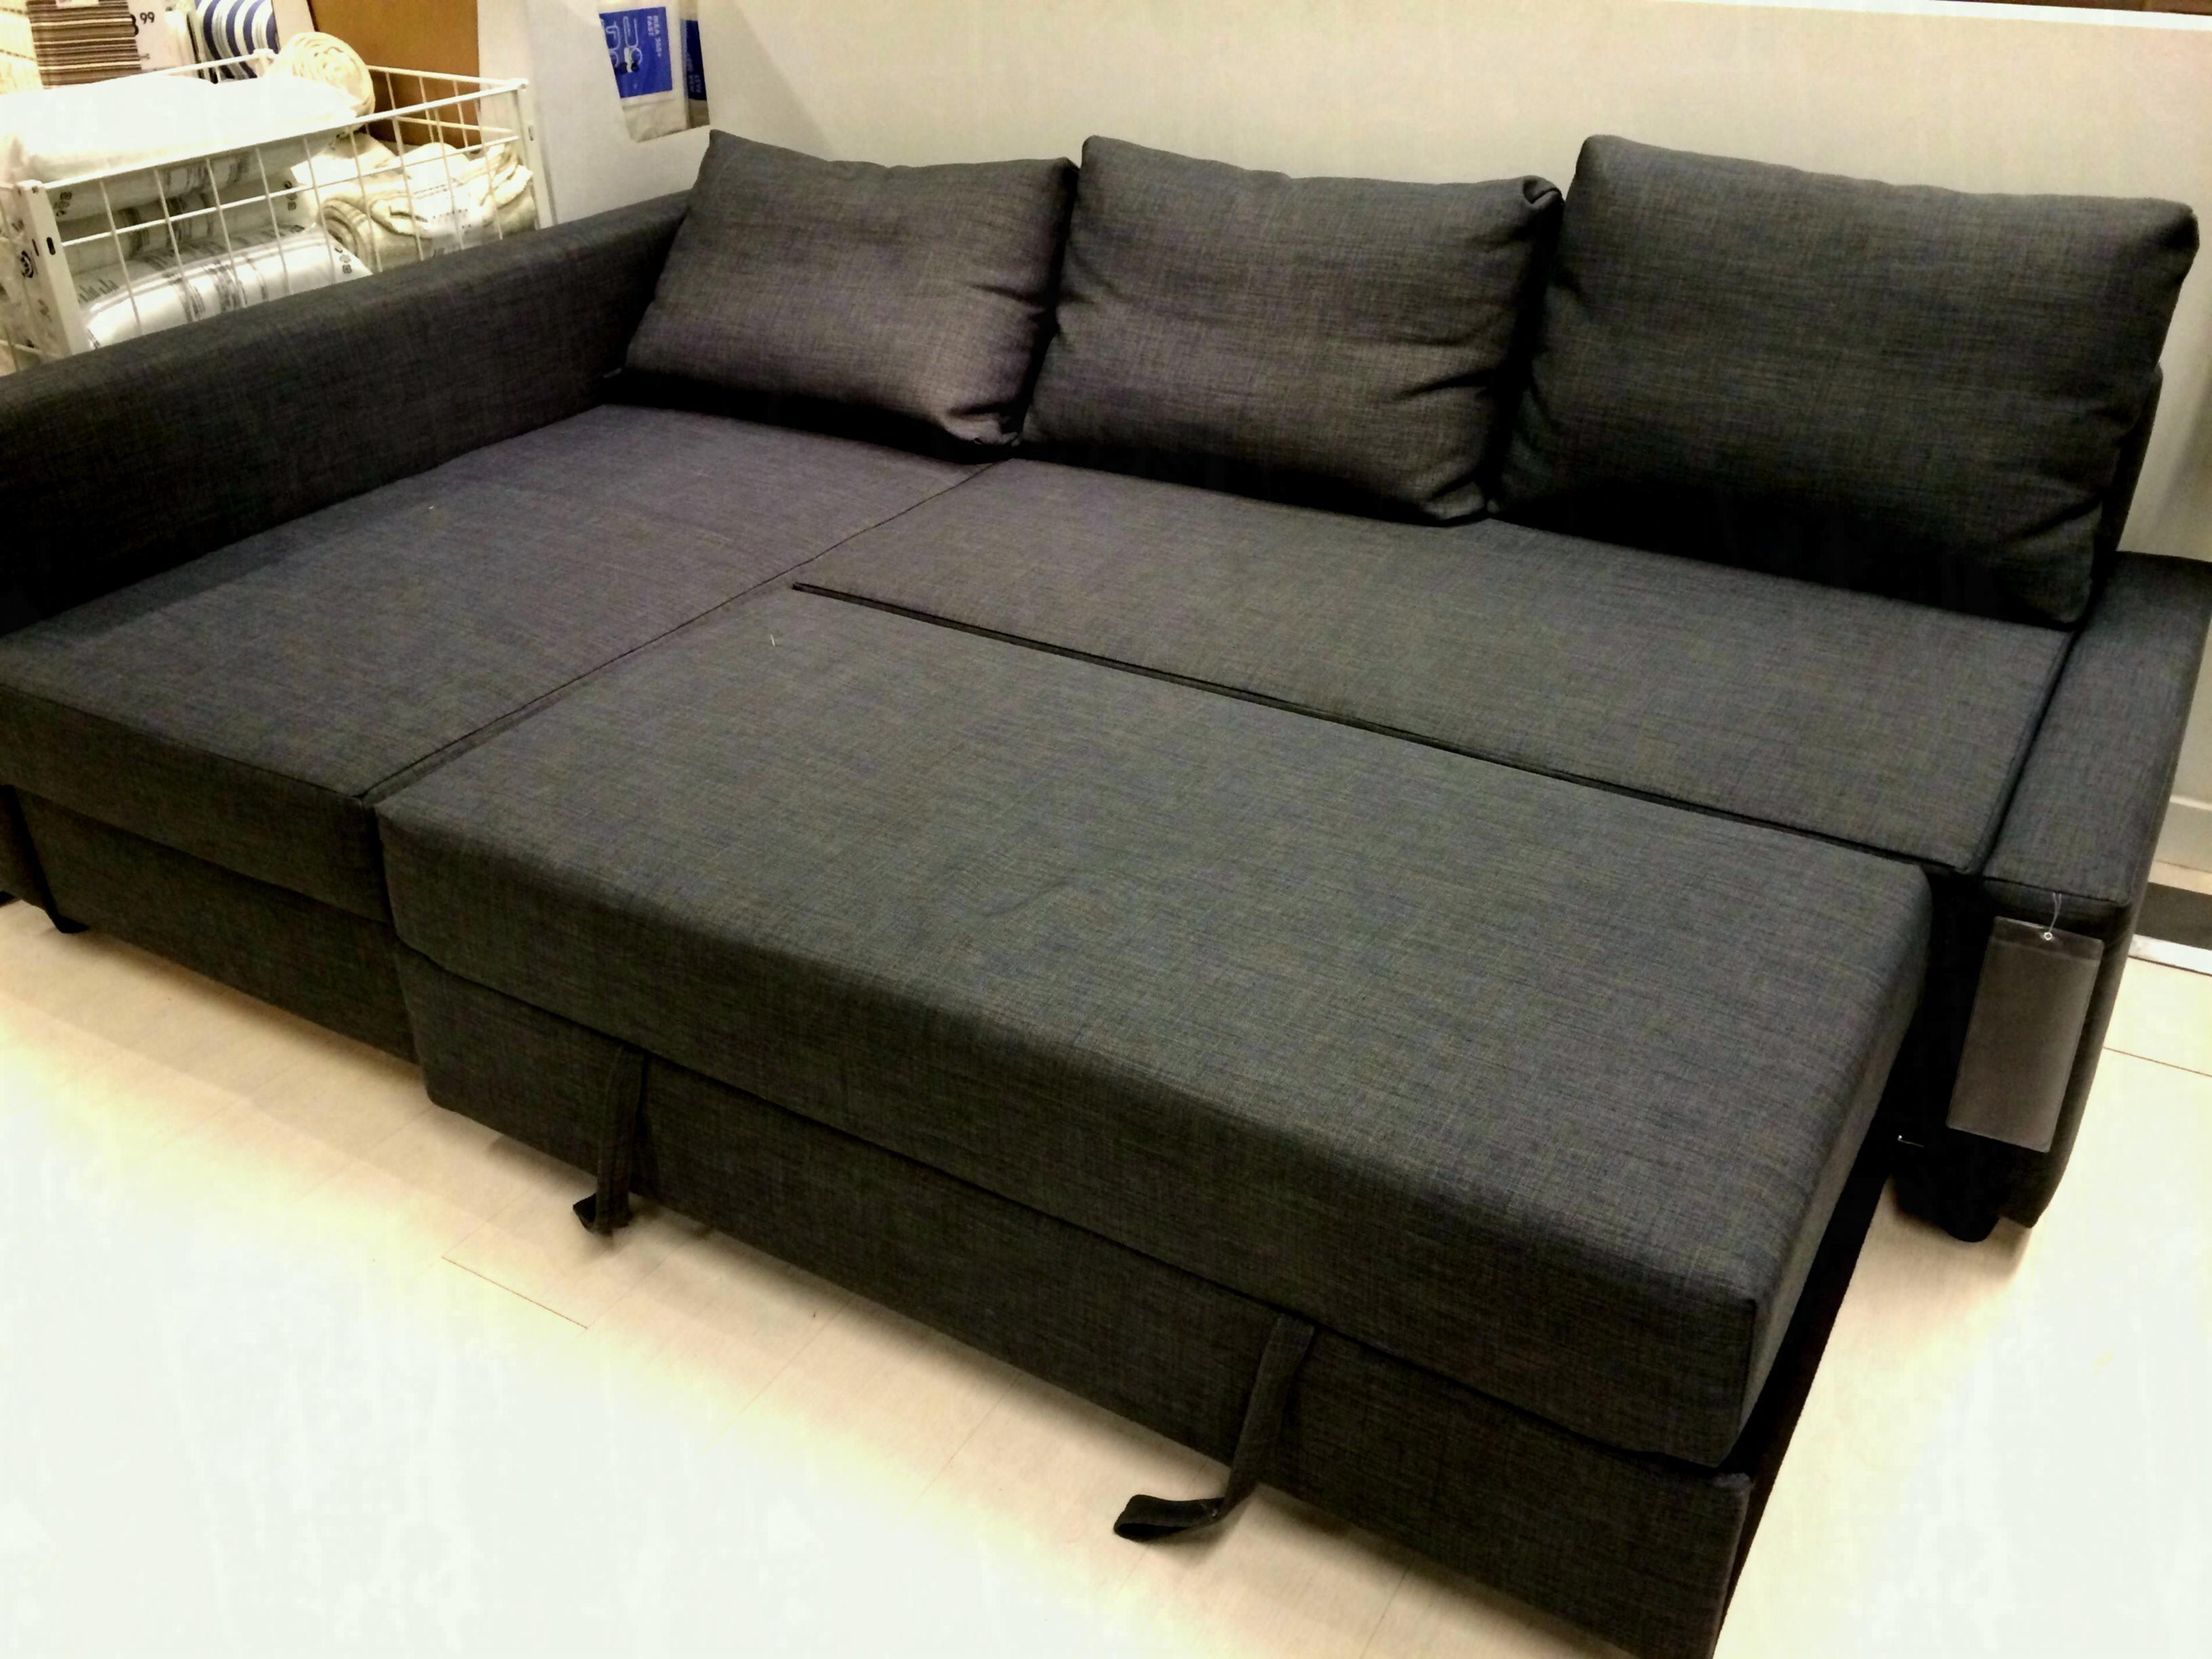 Friheten Ikea Avis Élégant Photographie Futon sofa Bed Ikea Covers Kskradio Beds Design